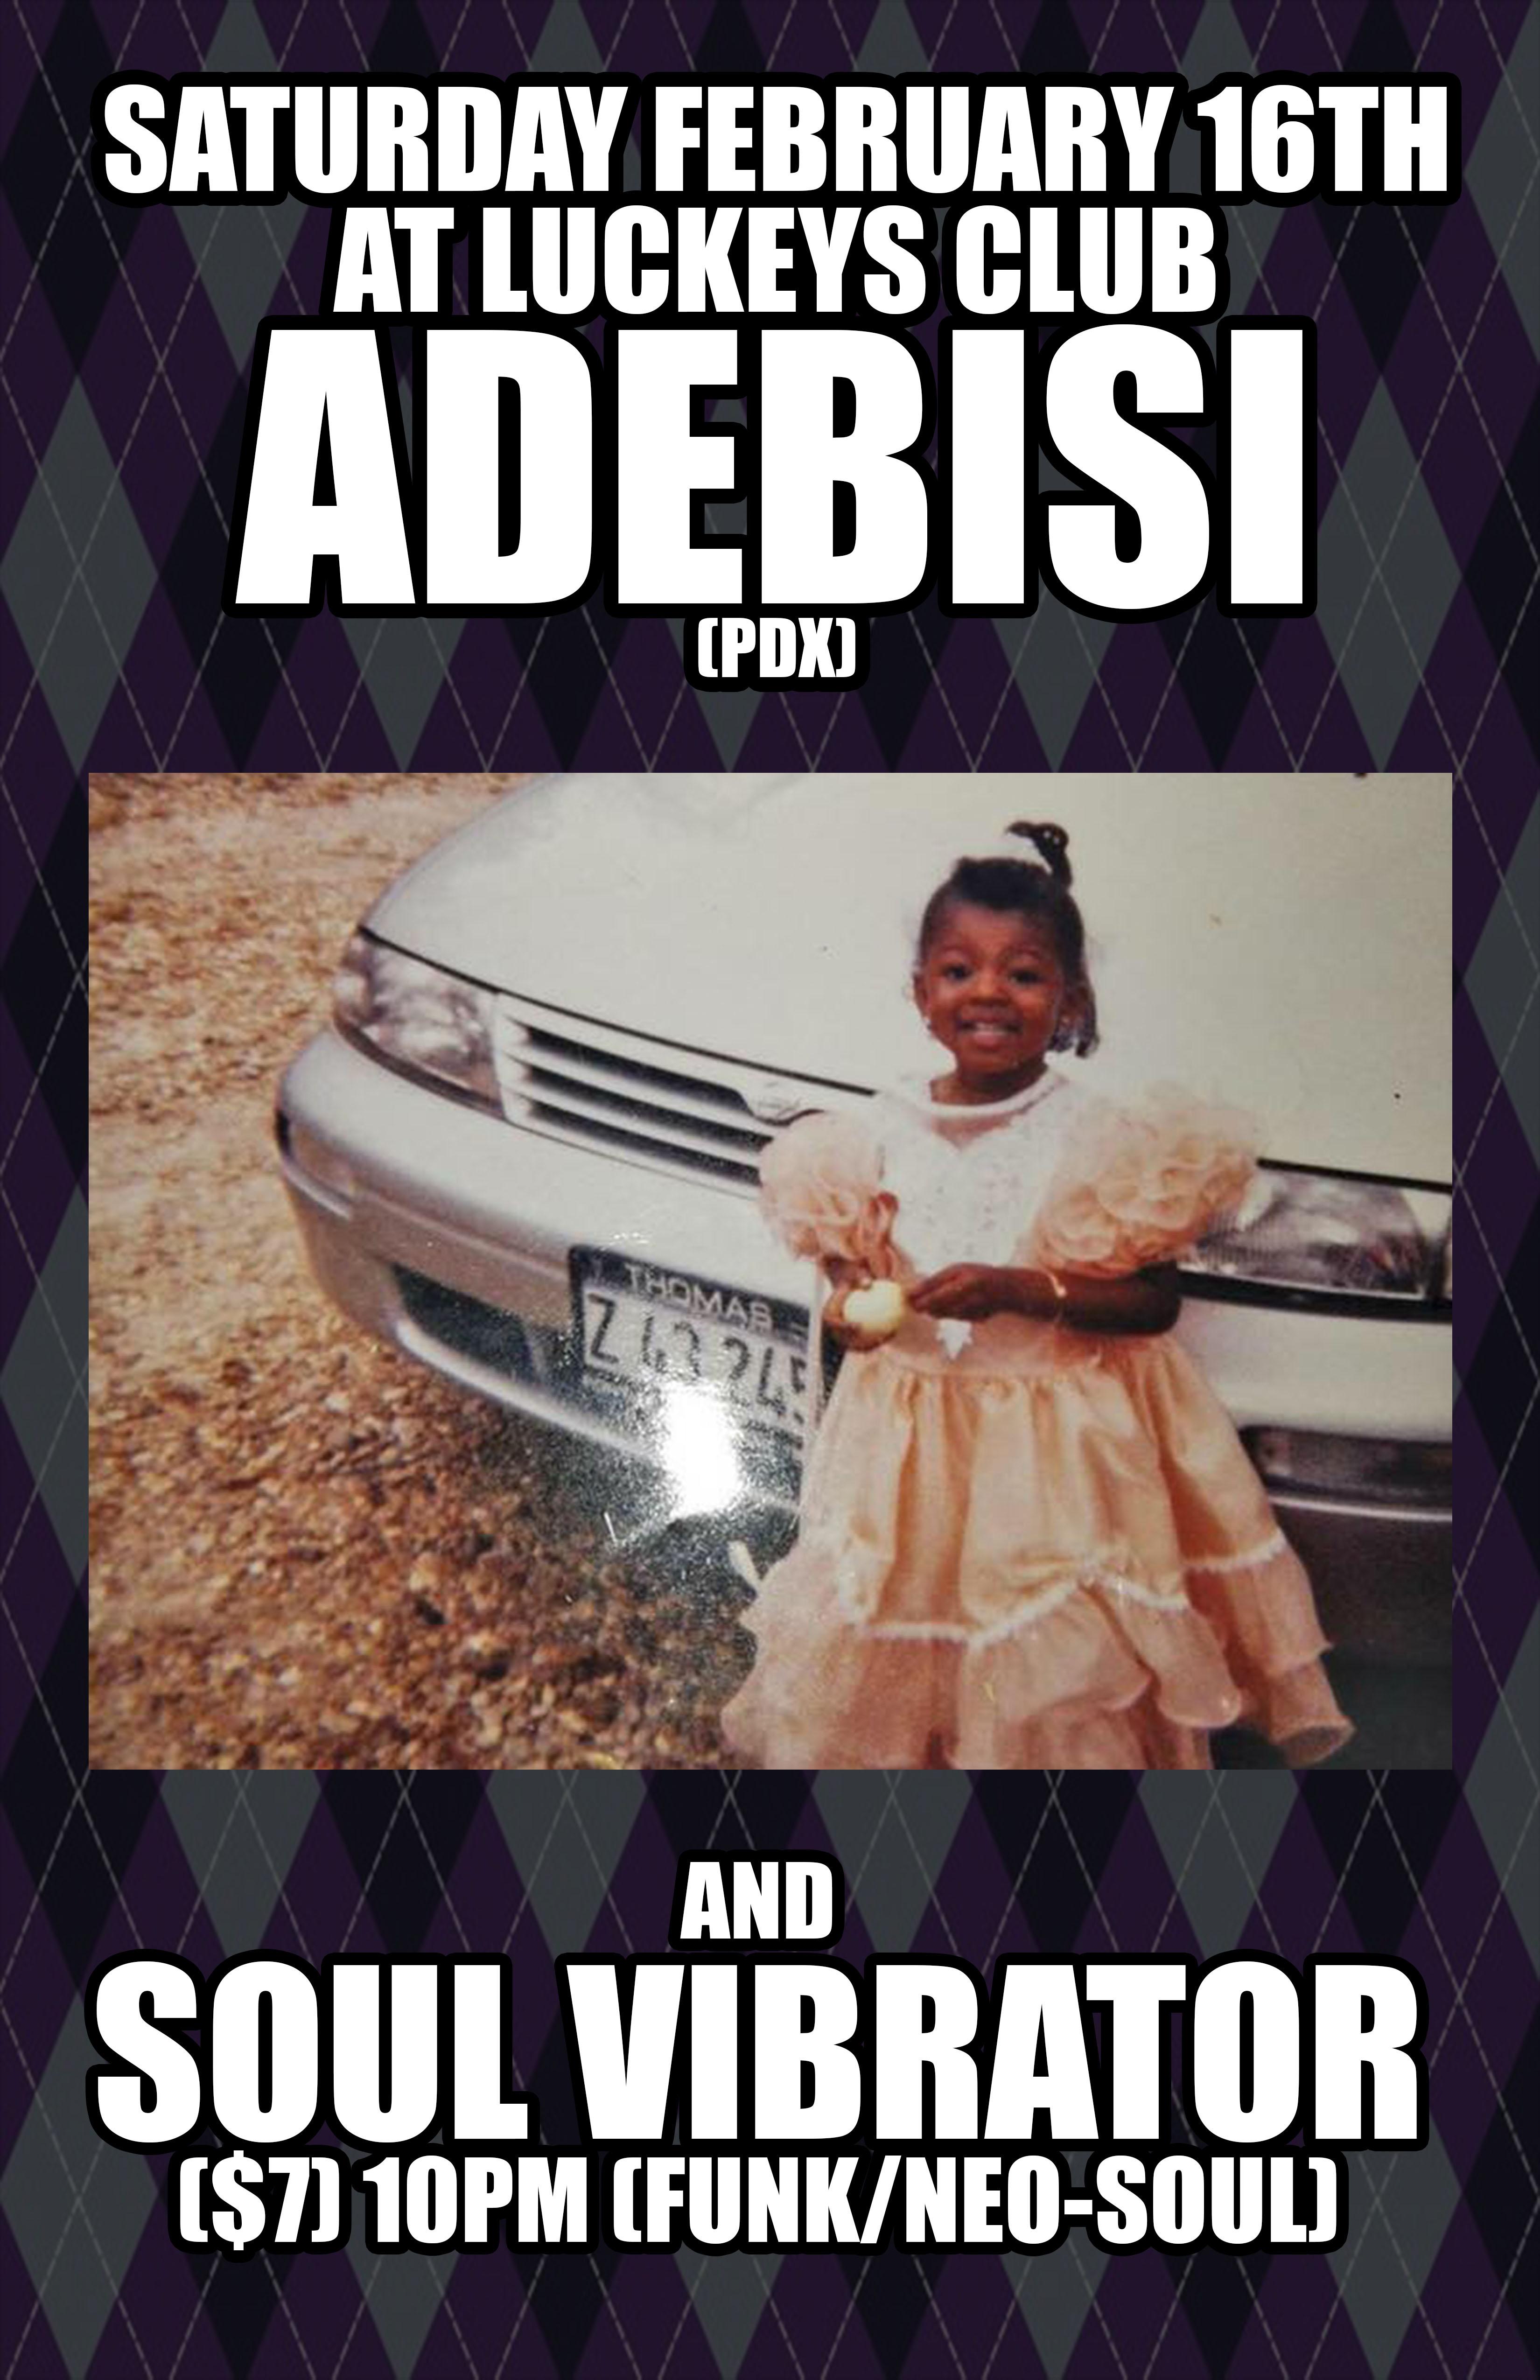 Soul Vibrator + Adebisi (pdx)